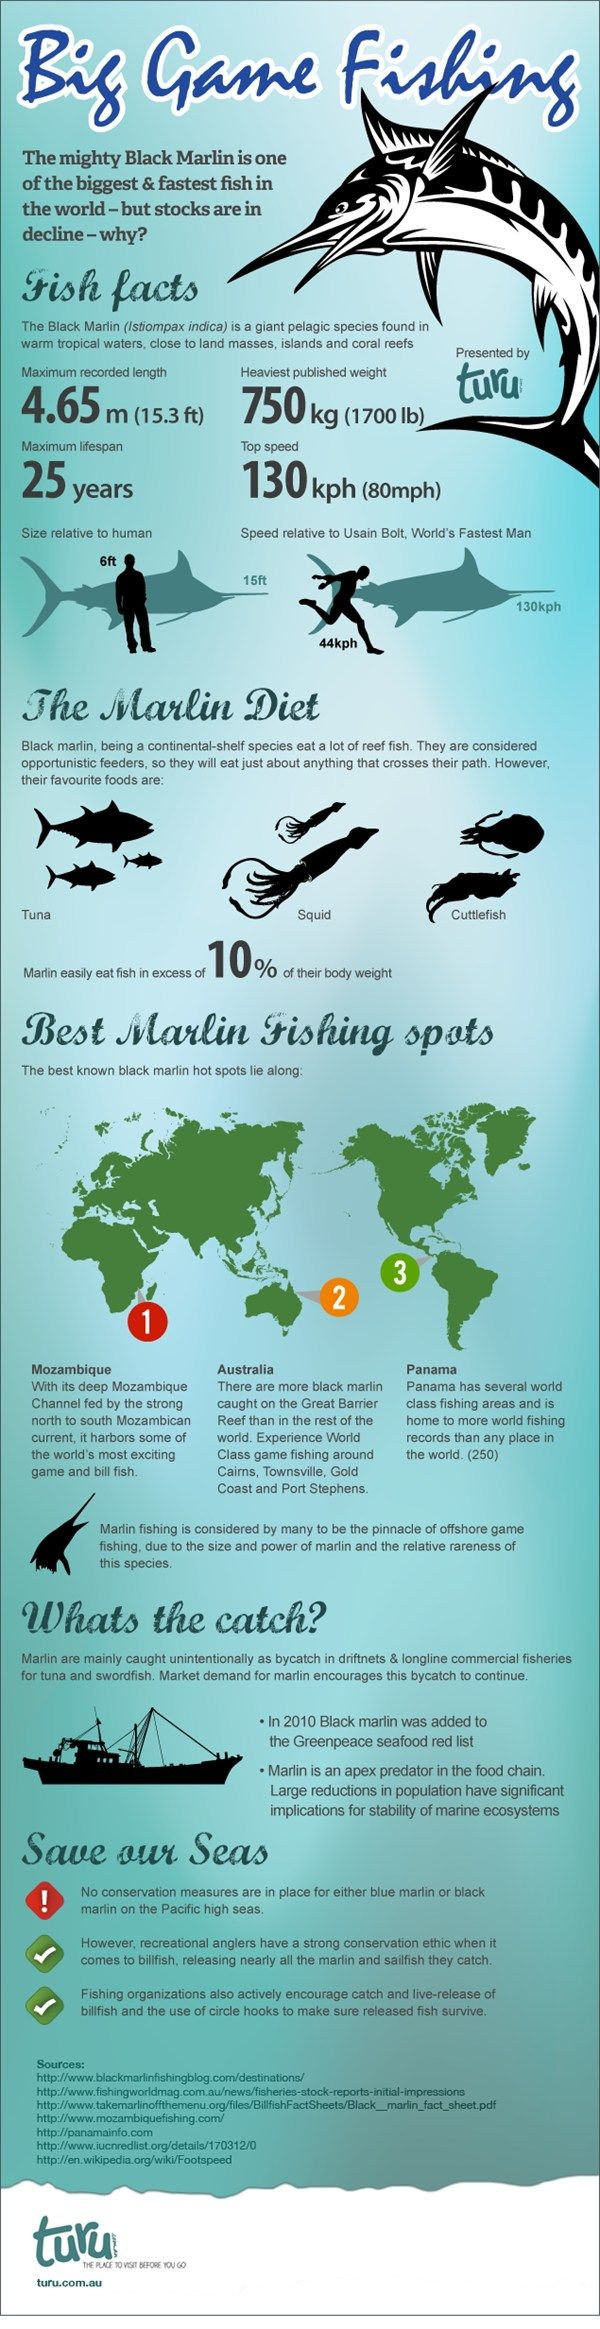 Big Game Fishing Infographic